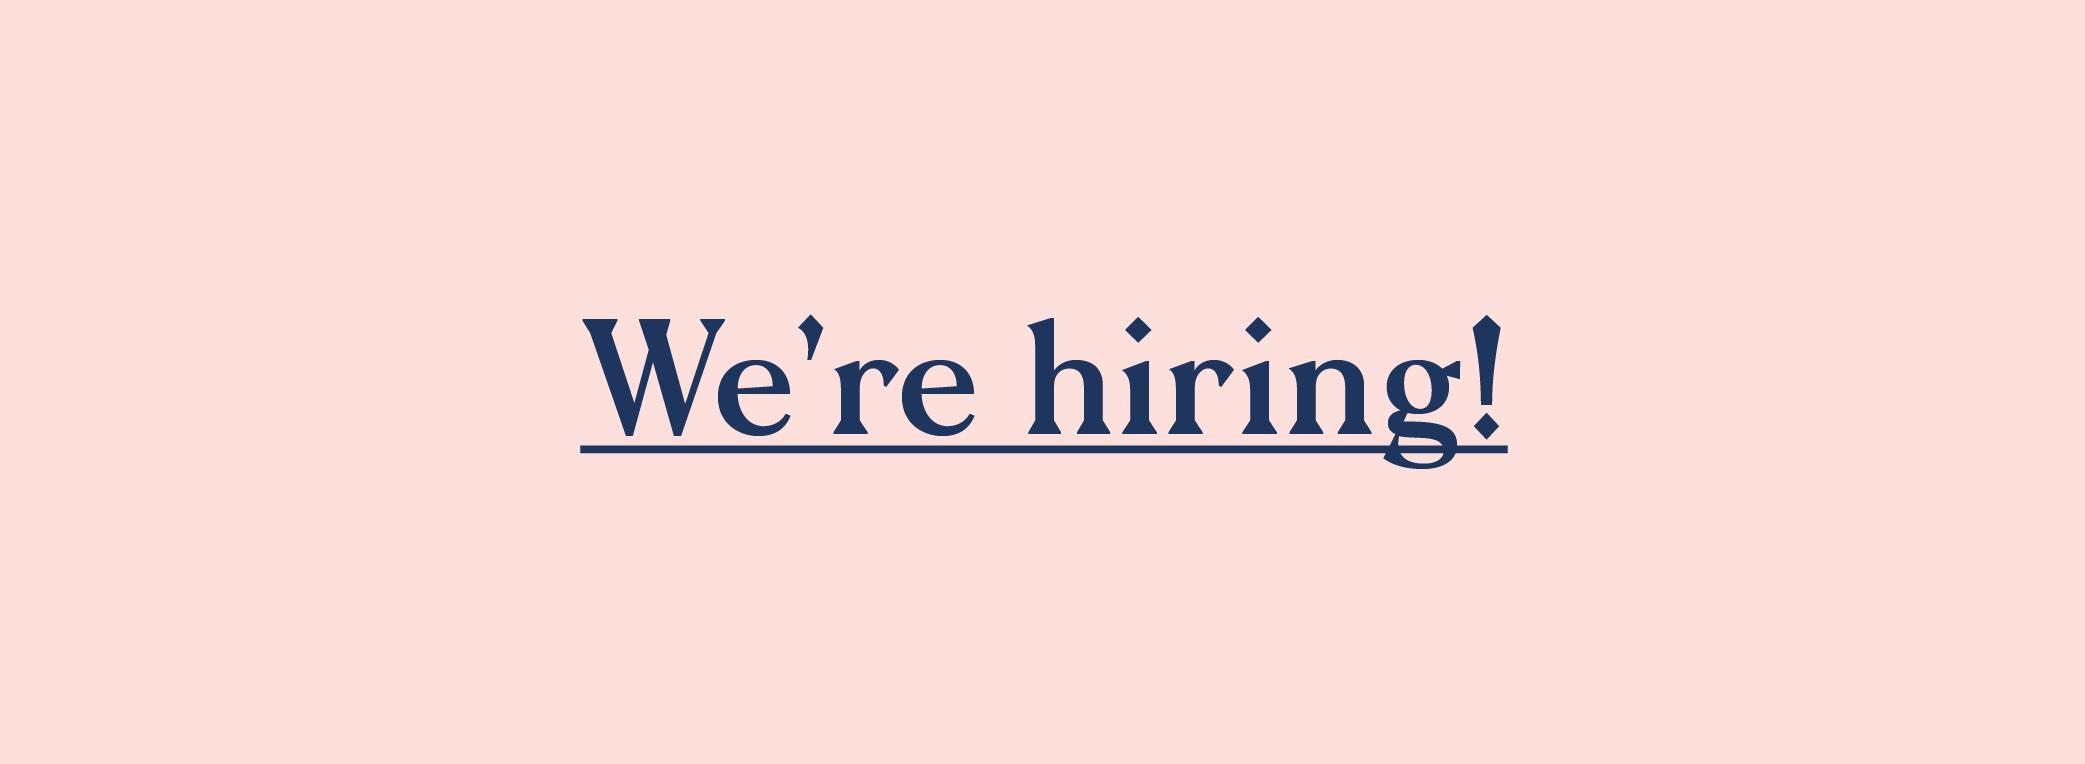 Job Banners_We're Hiring